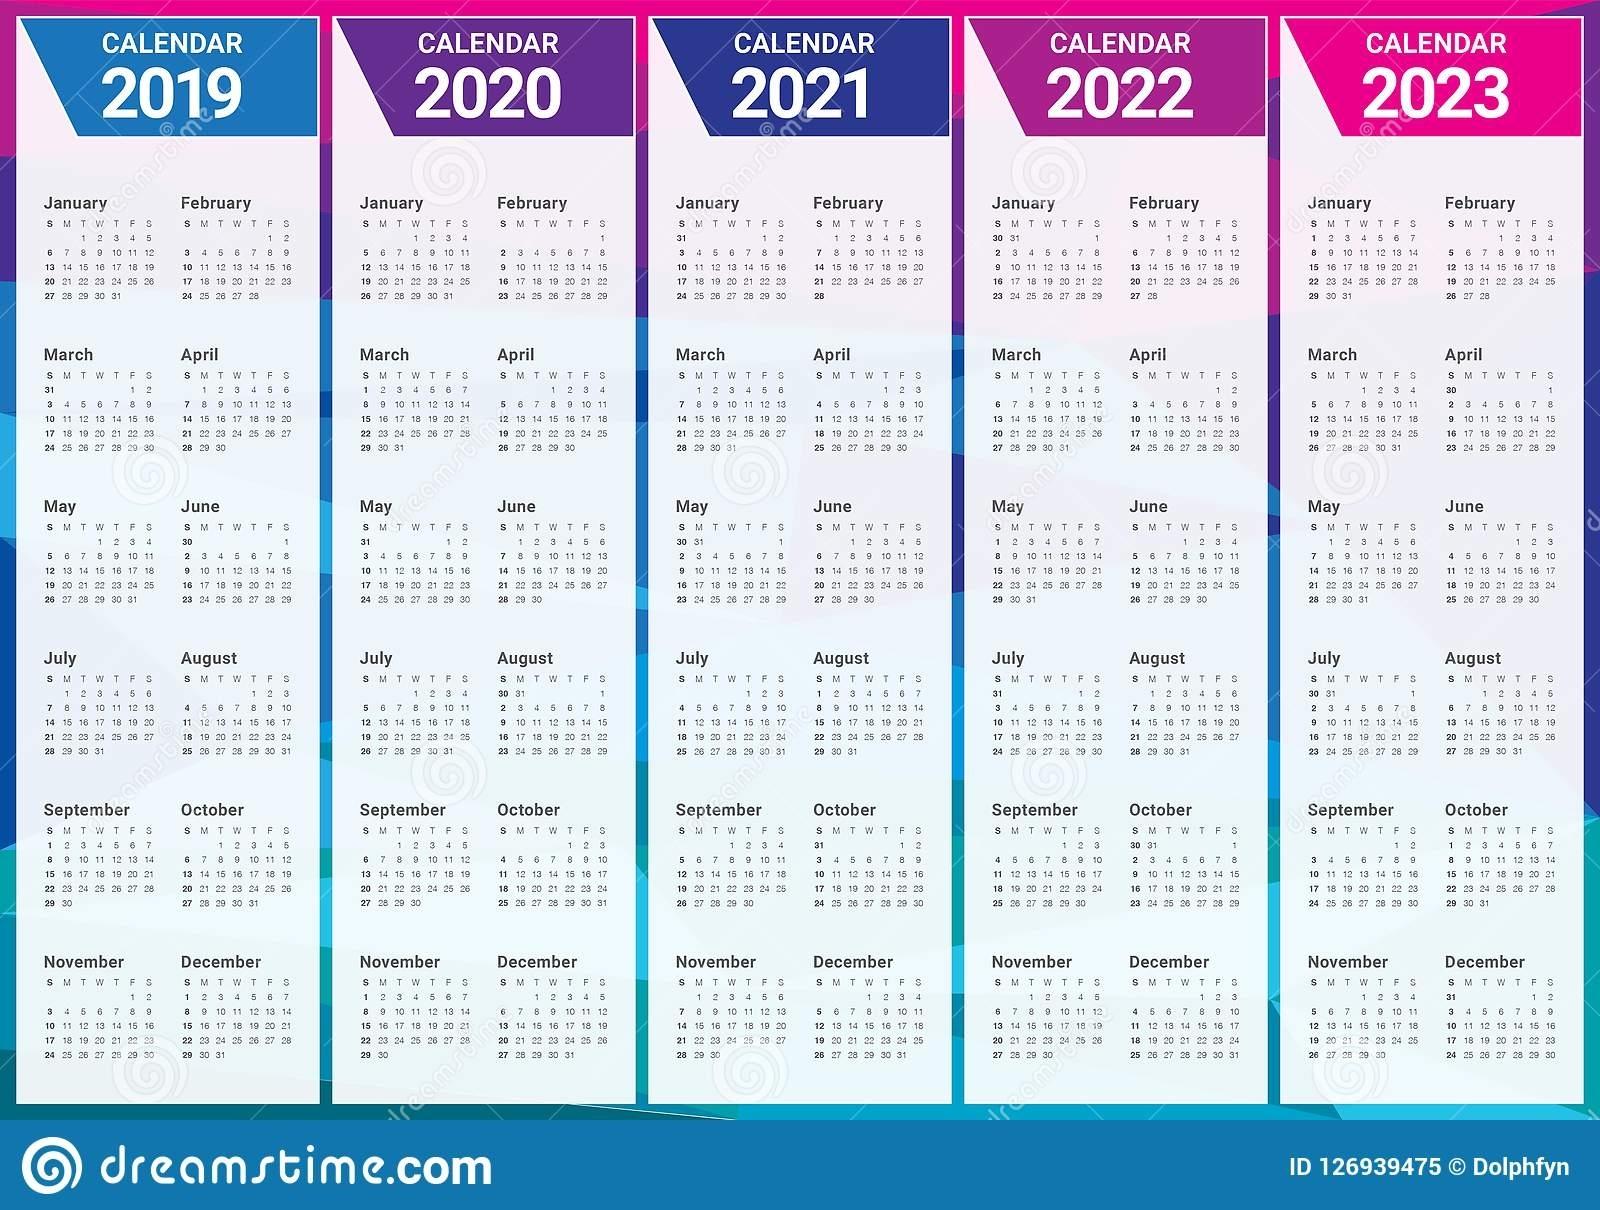 Year 2019 2020 2021 2022 2023 Calendar Vector Design for 2020 2021 2022 2023 Calendar